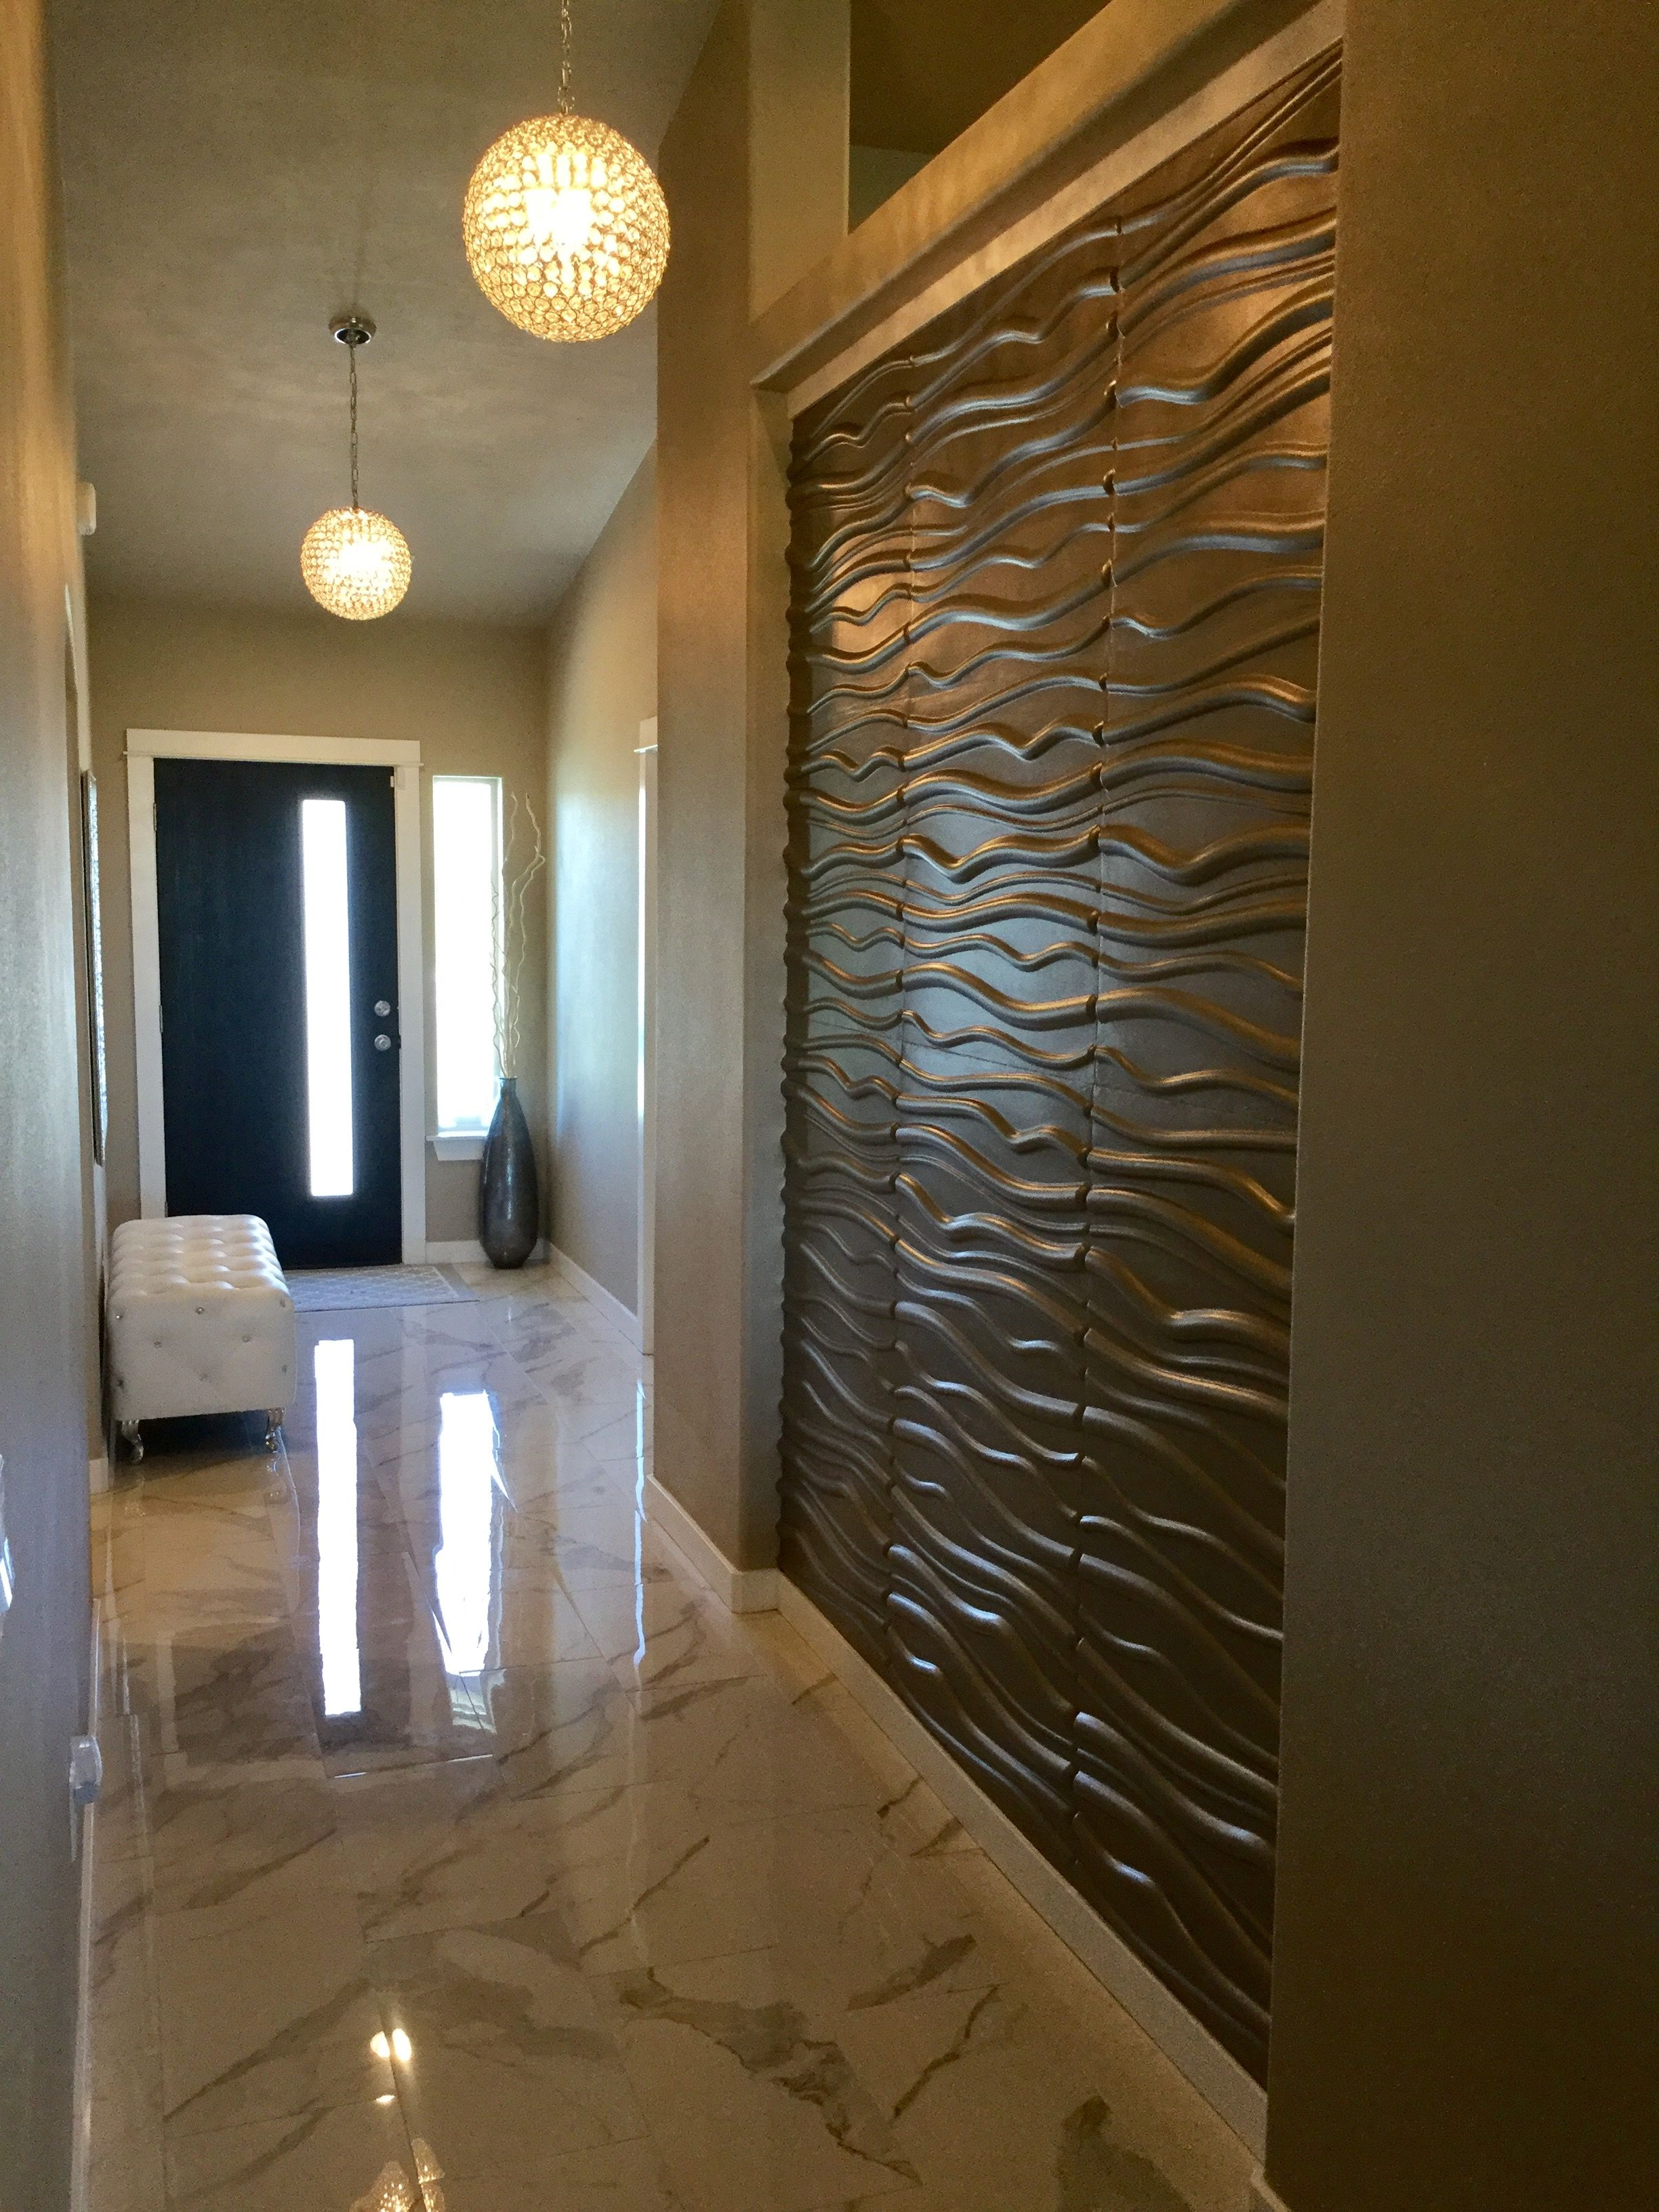 3d wall panels in hallway using metallic memories paint. Black Bedroom Furniture Sets. Home Design Ideas